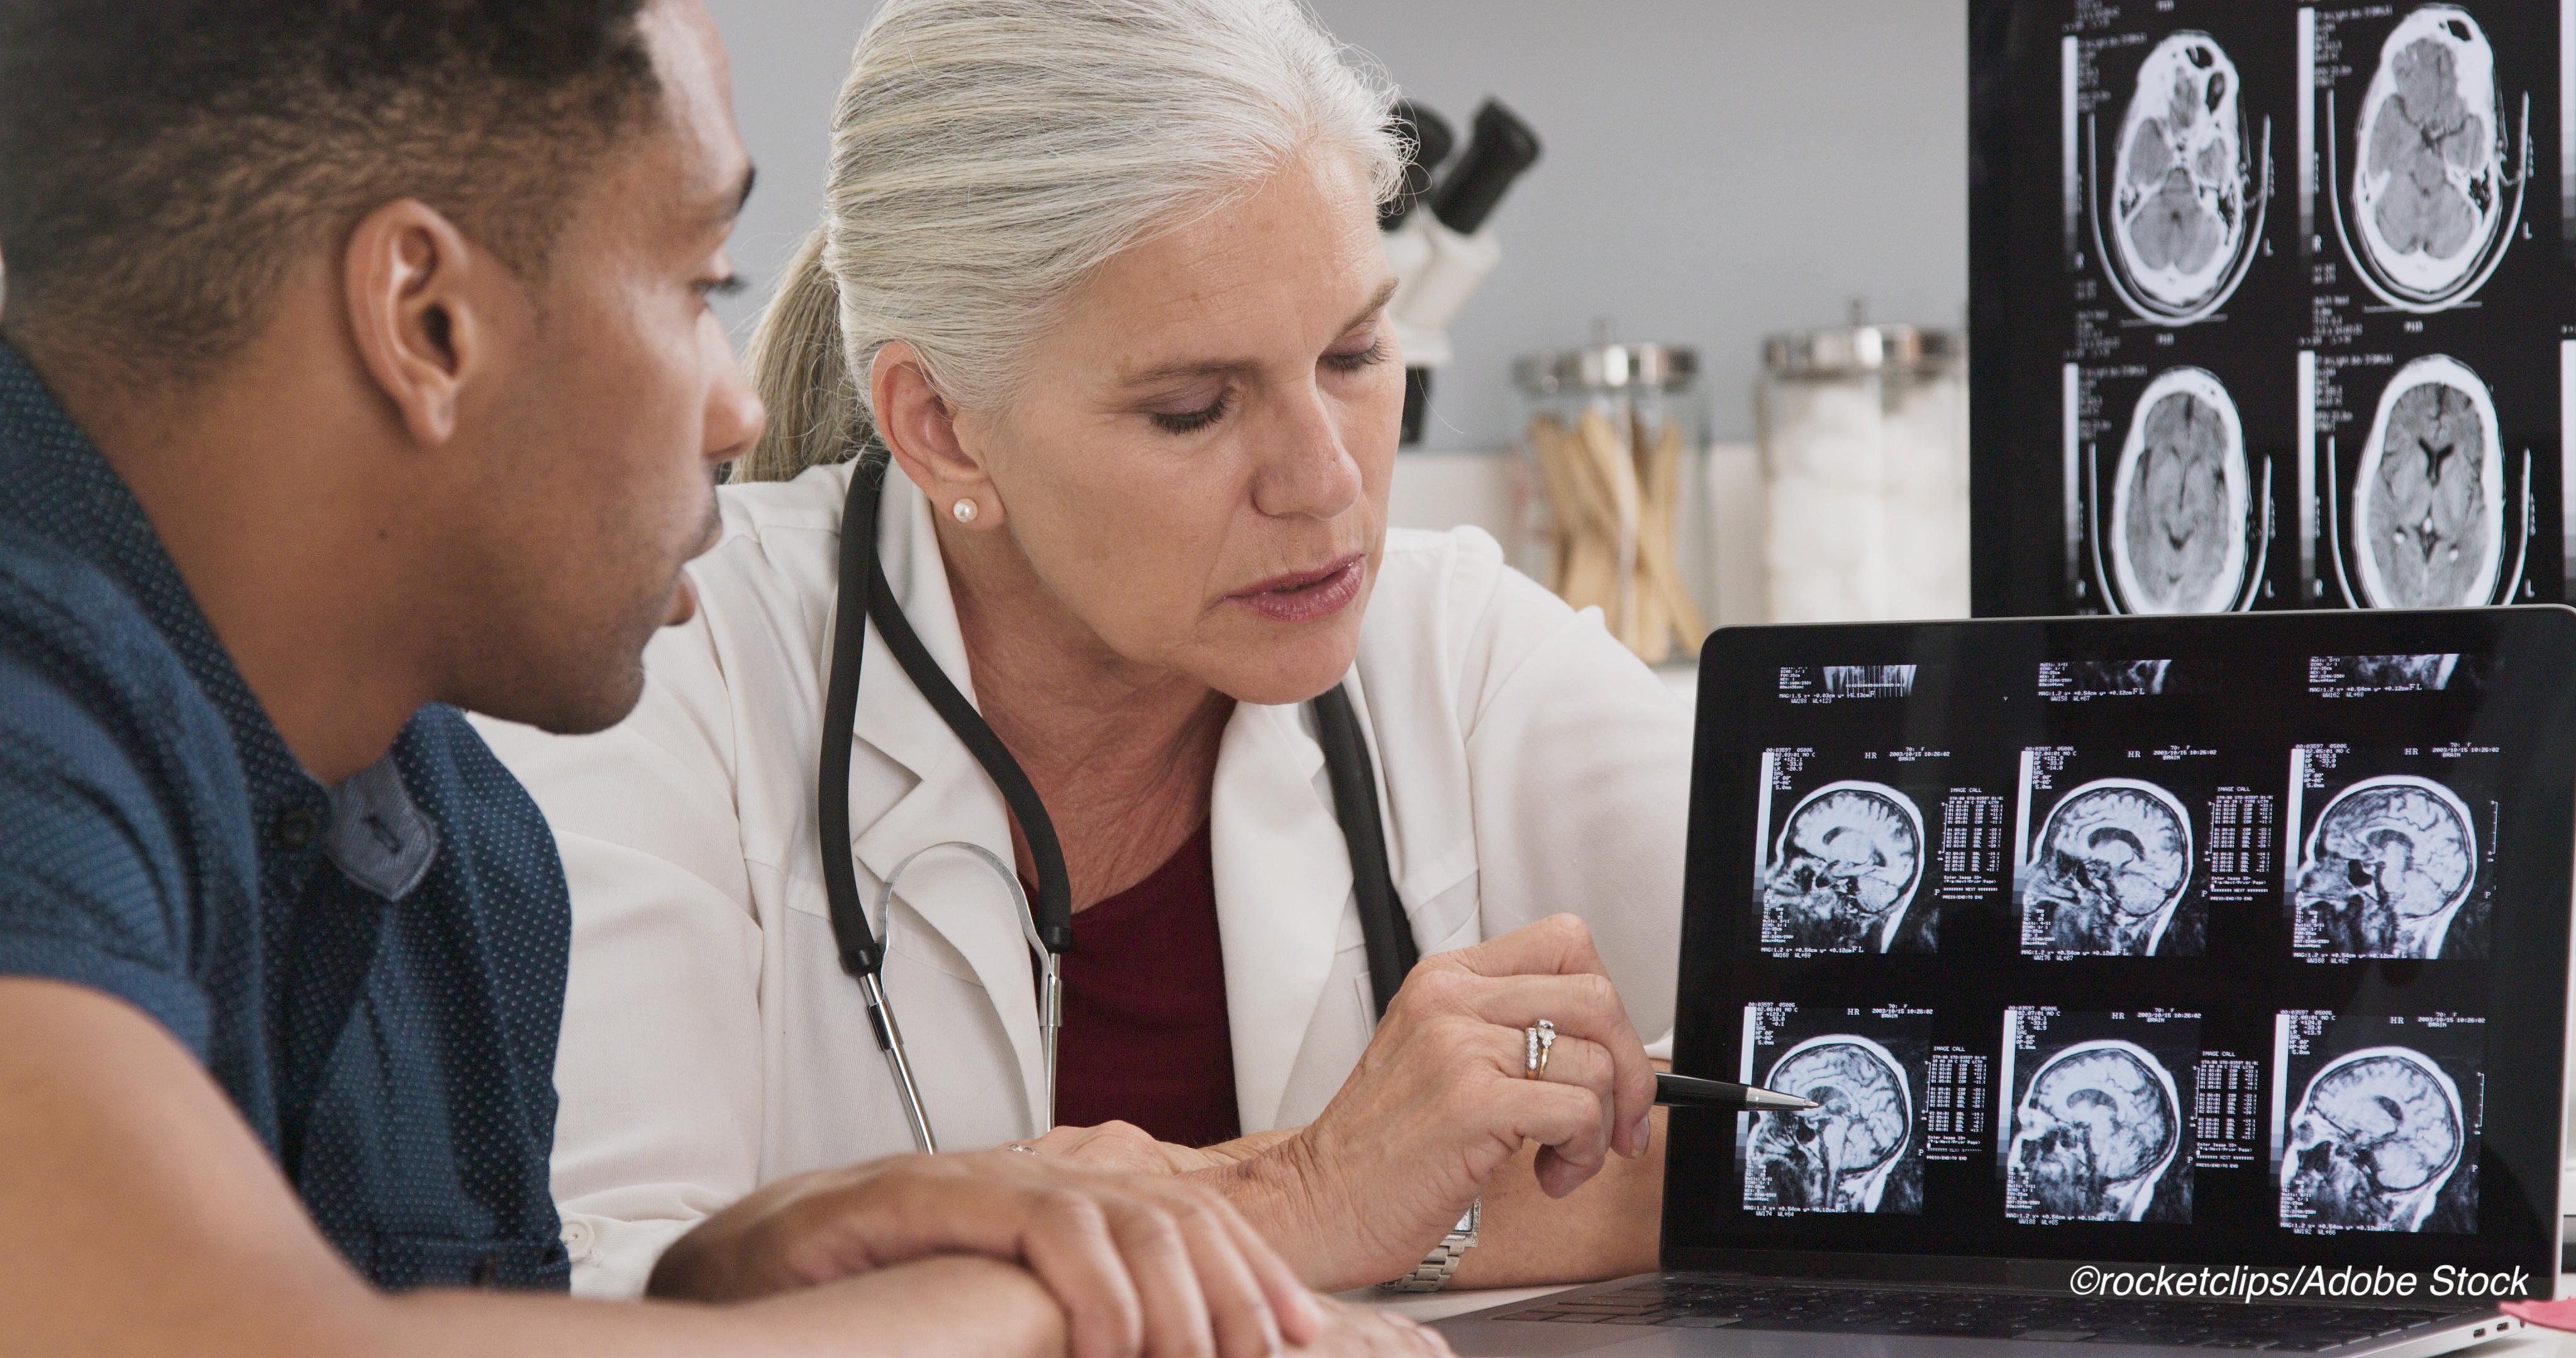 Women, Minorities Less Likely to Get Timely Brain Imaging in Stroke